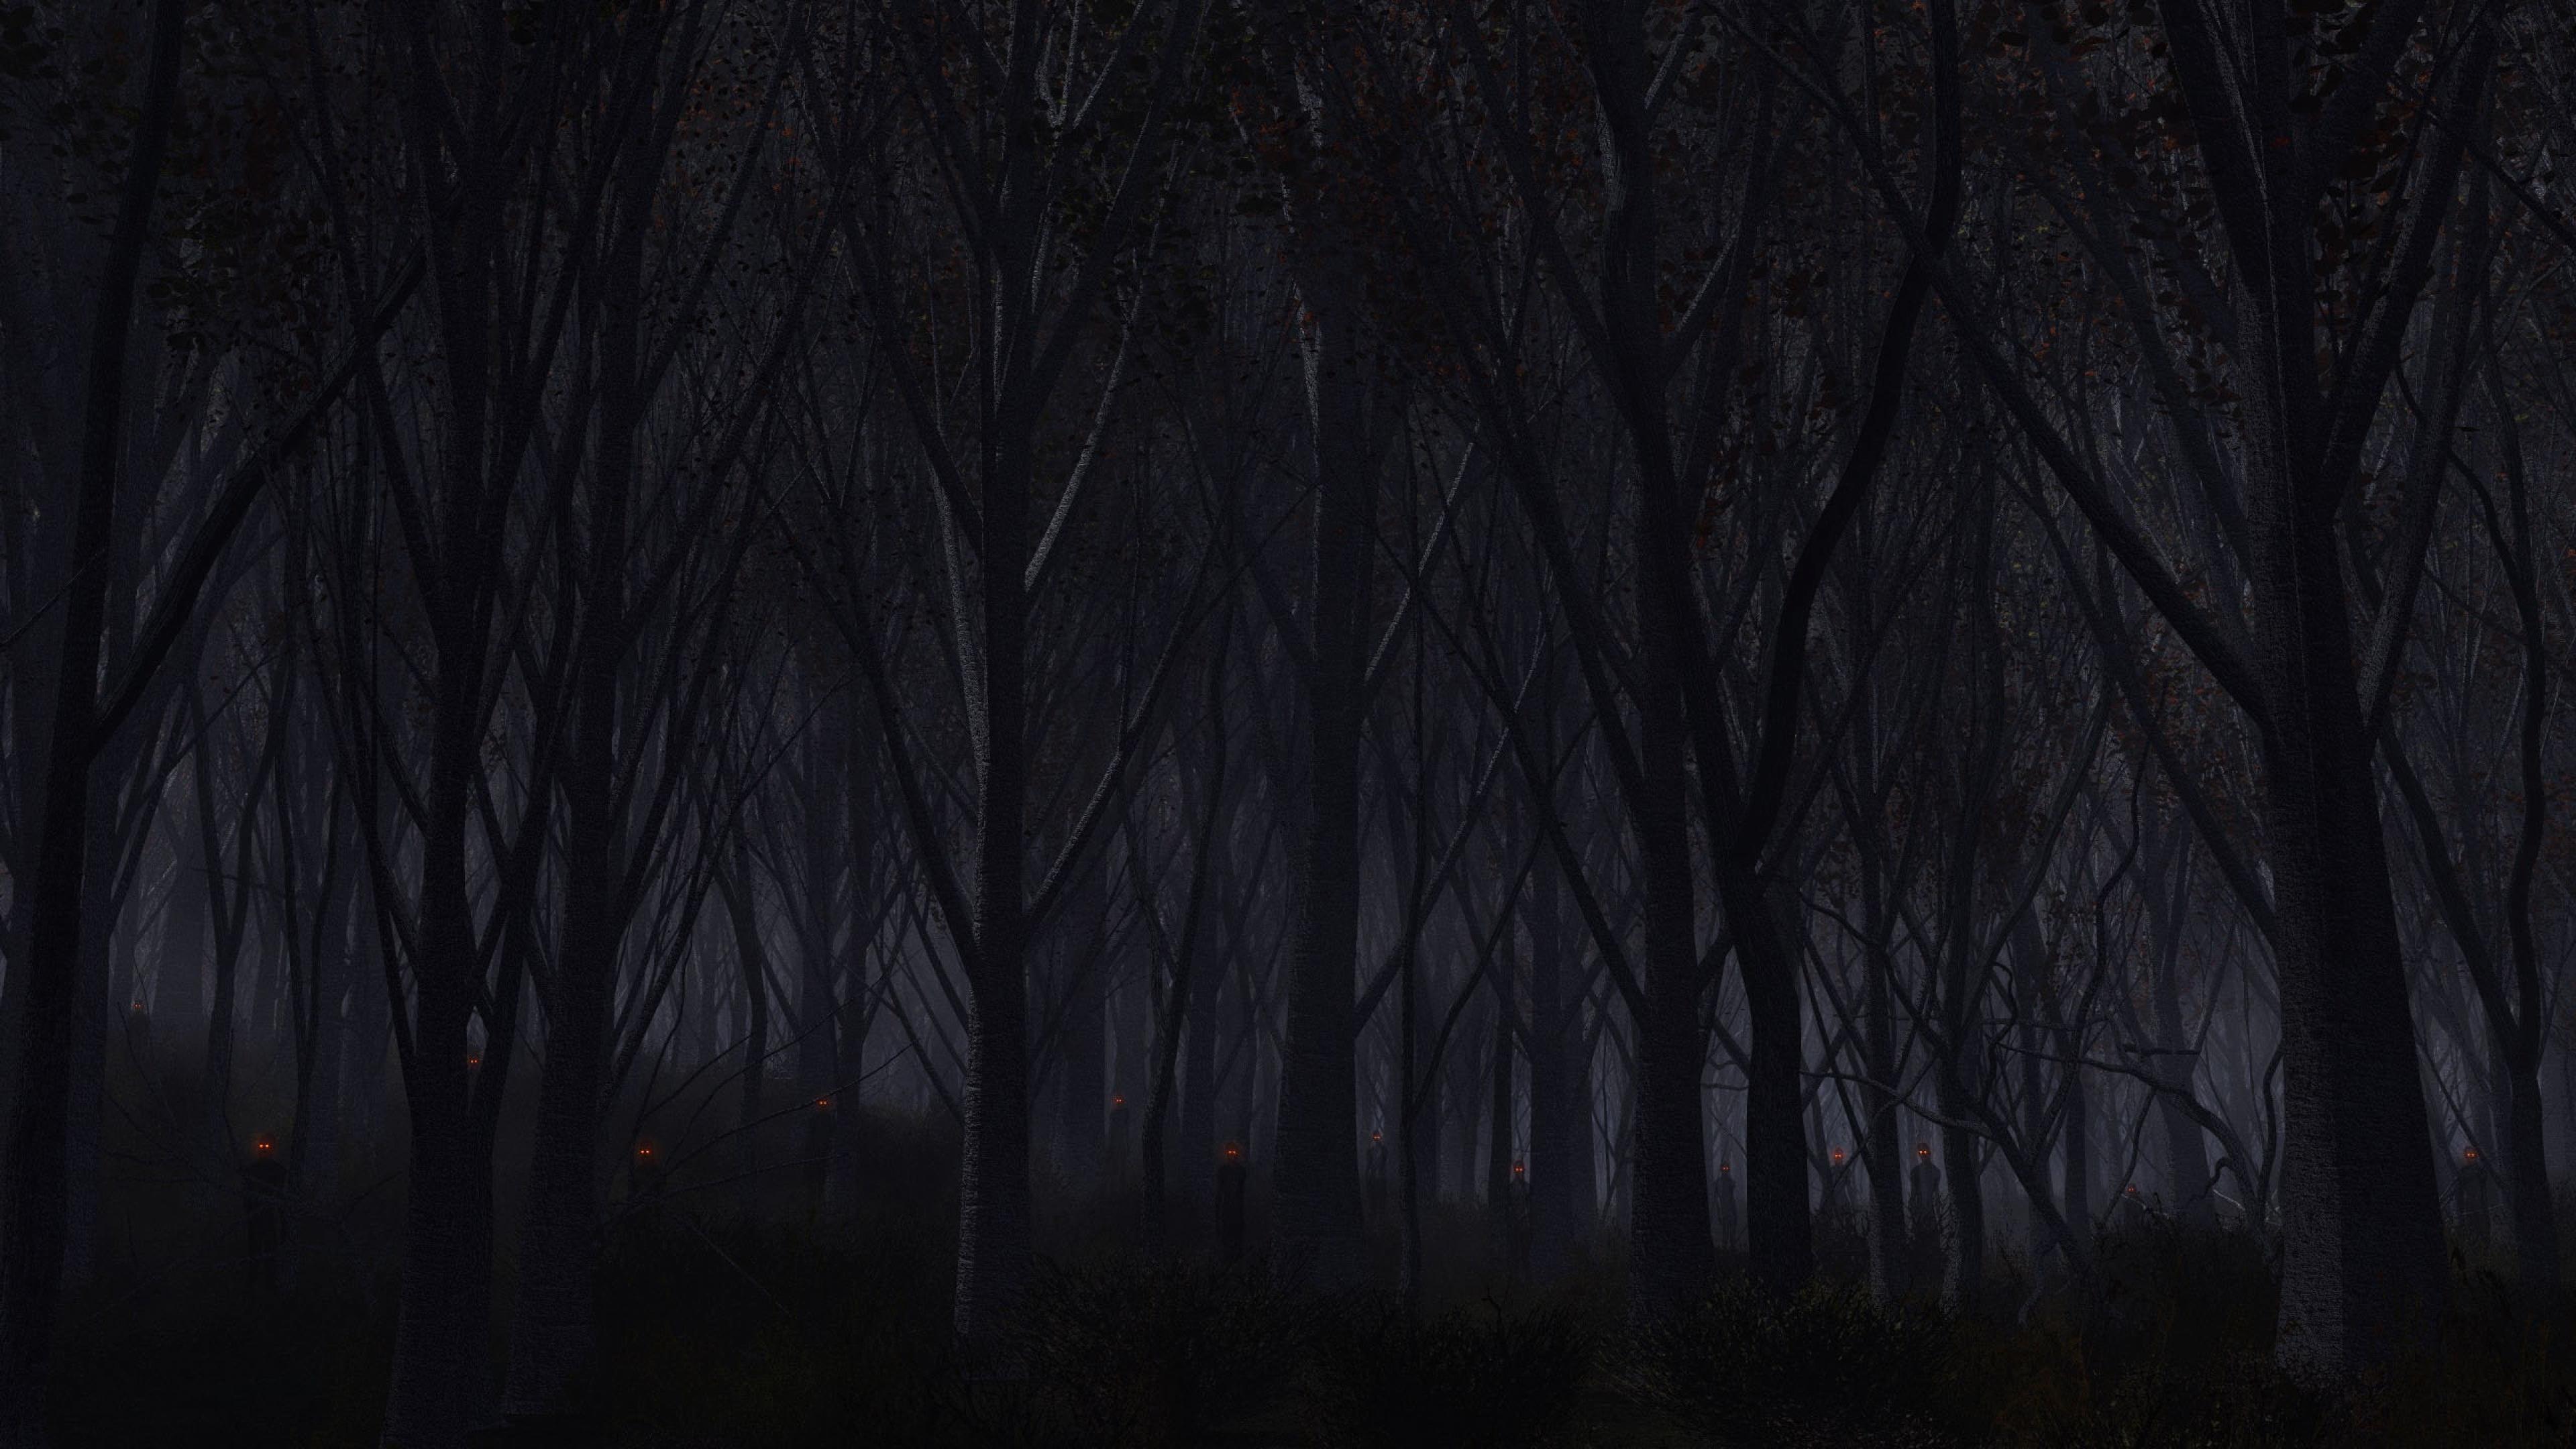 Forest Trees Background Dark Wallpaper Background 4K Ultra HD 3840x2160